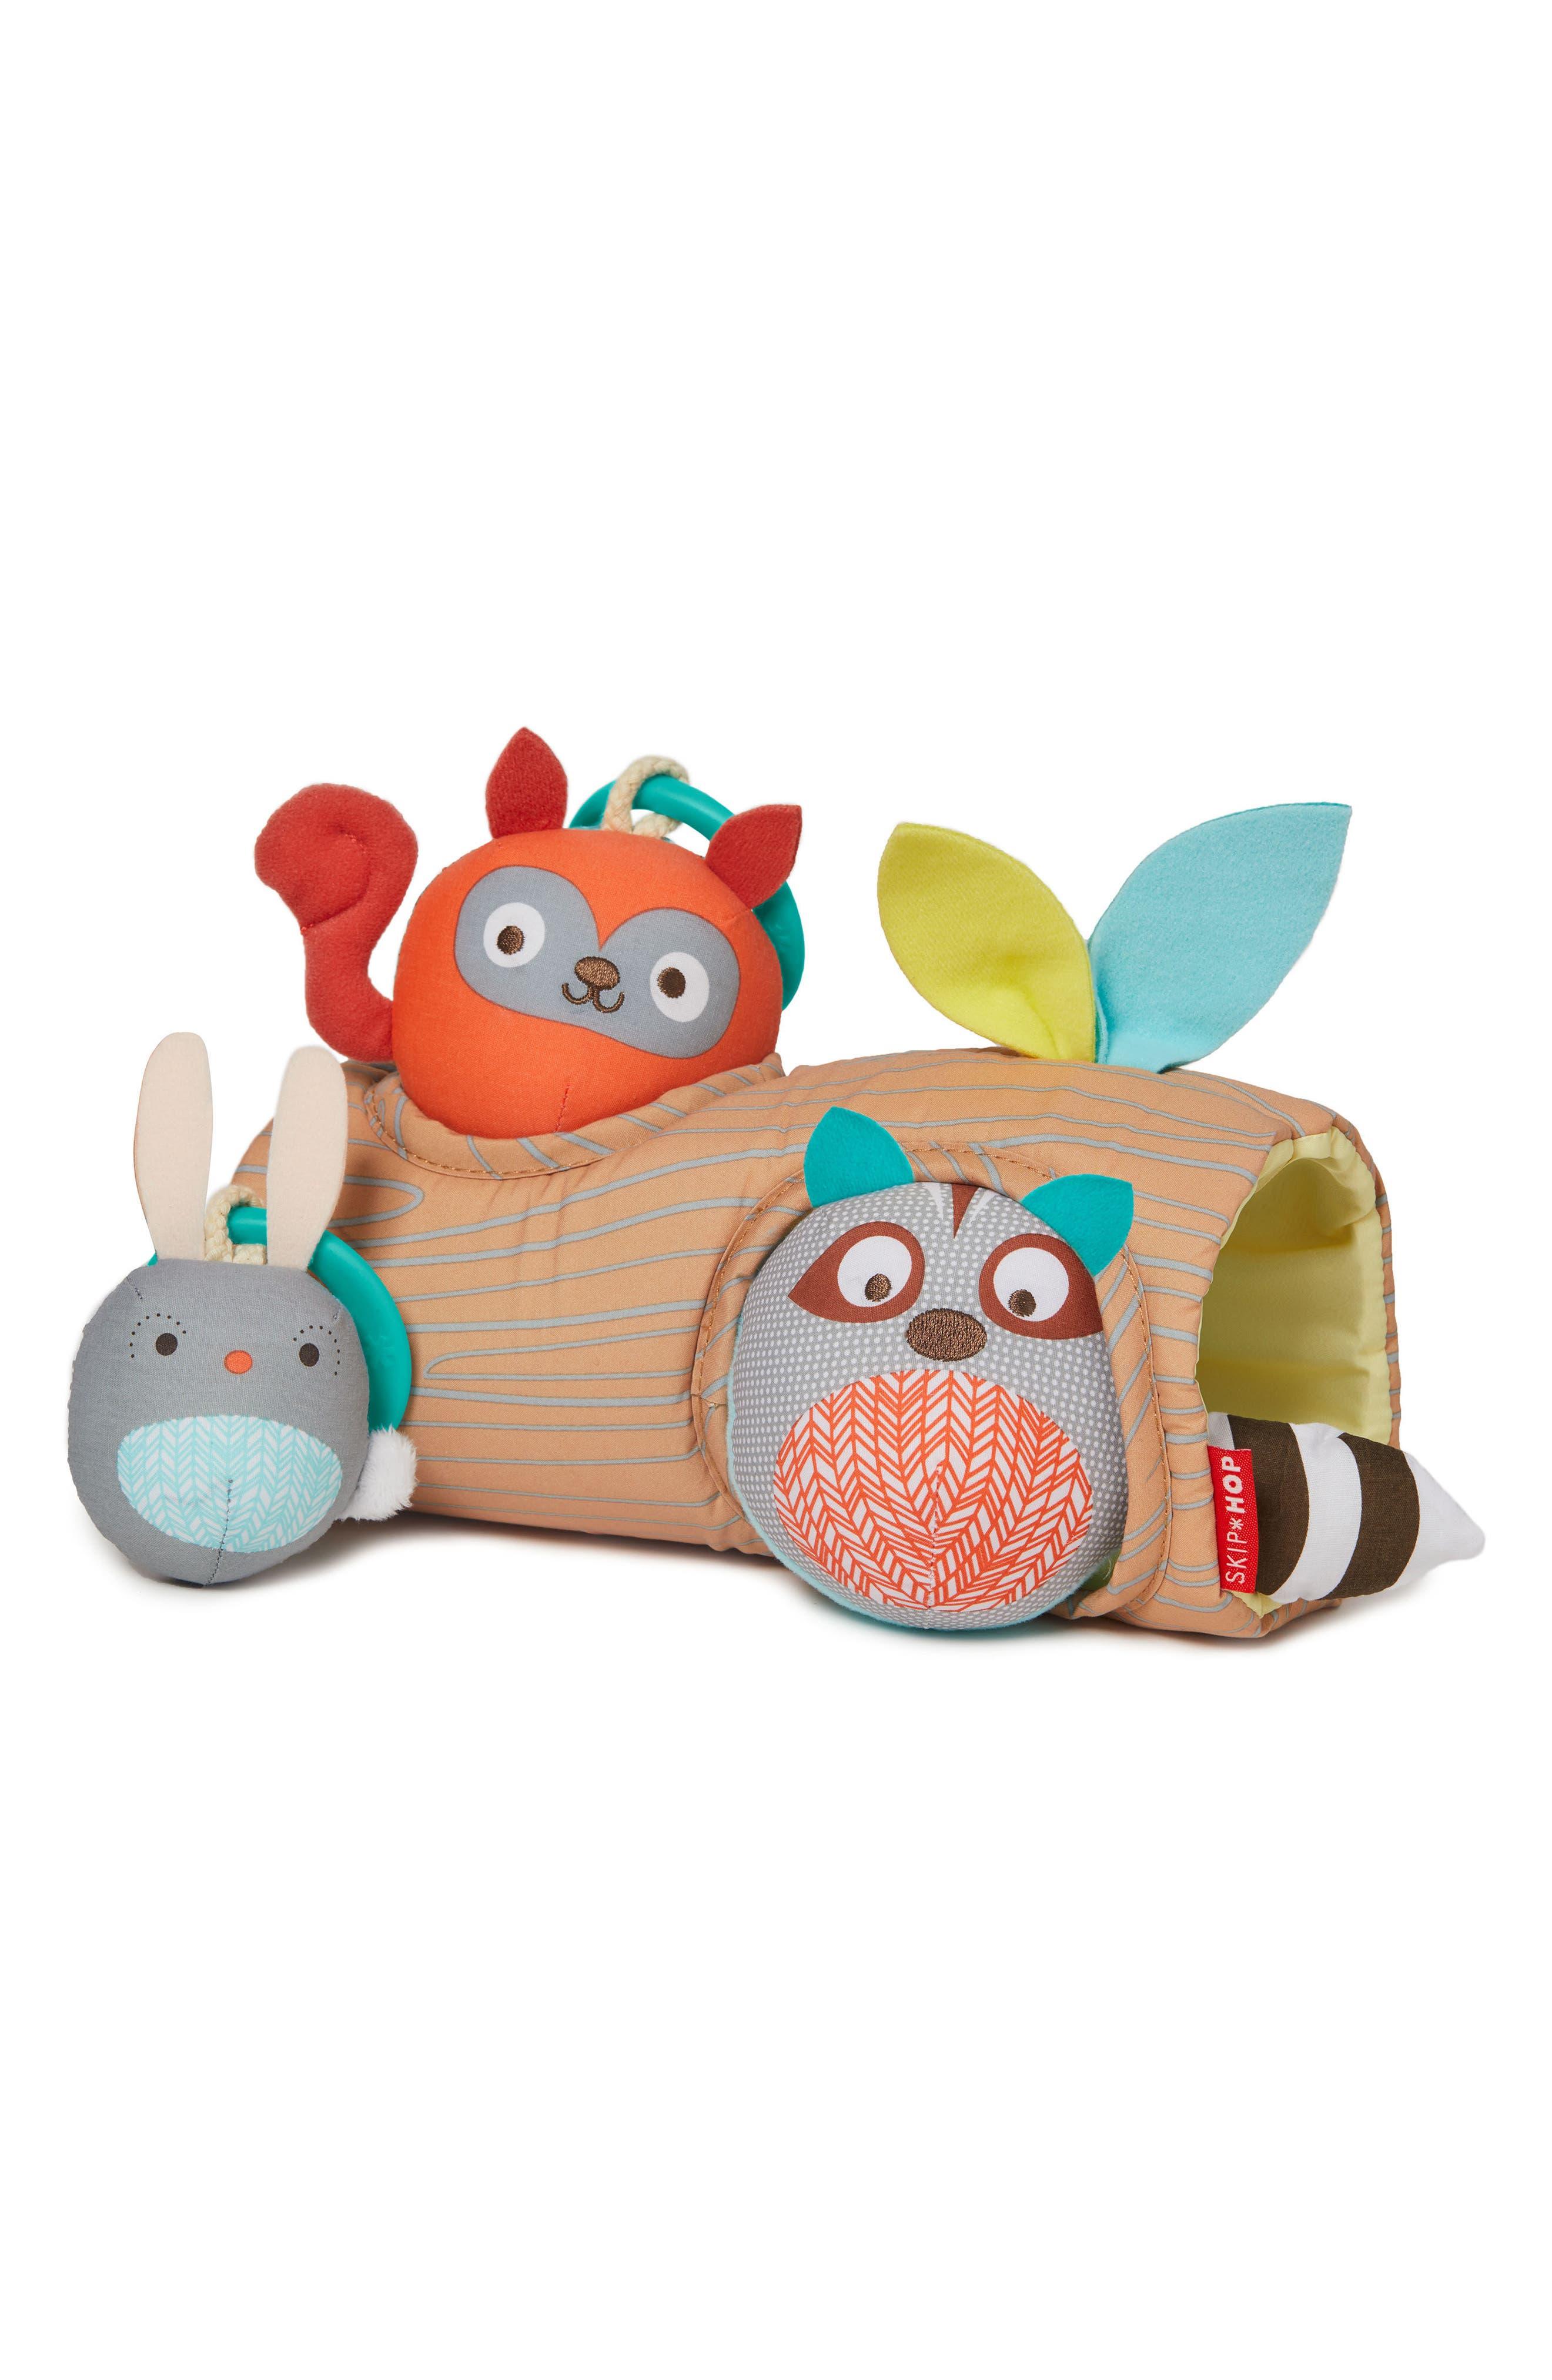 Skip Hop Camping Cubs Peek-a-Boo Ball Rattle Trio Toy